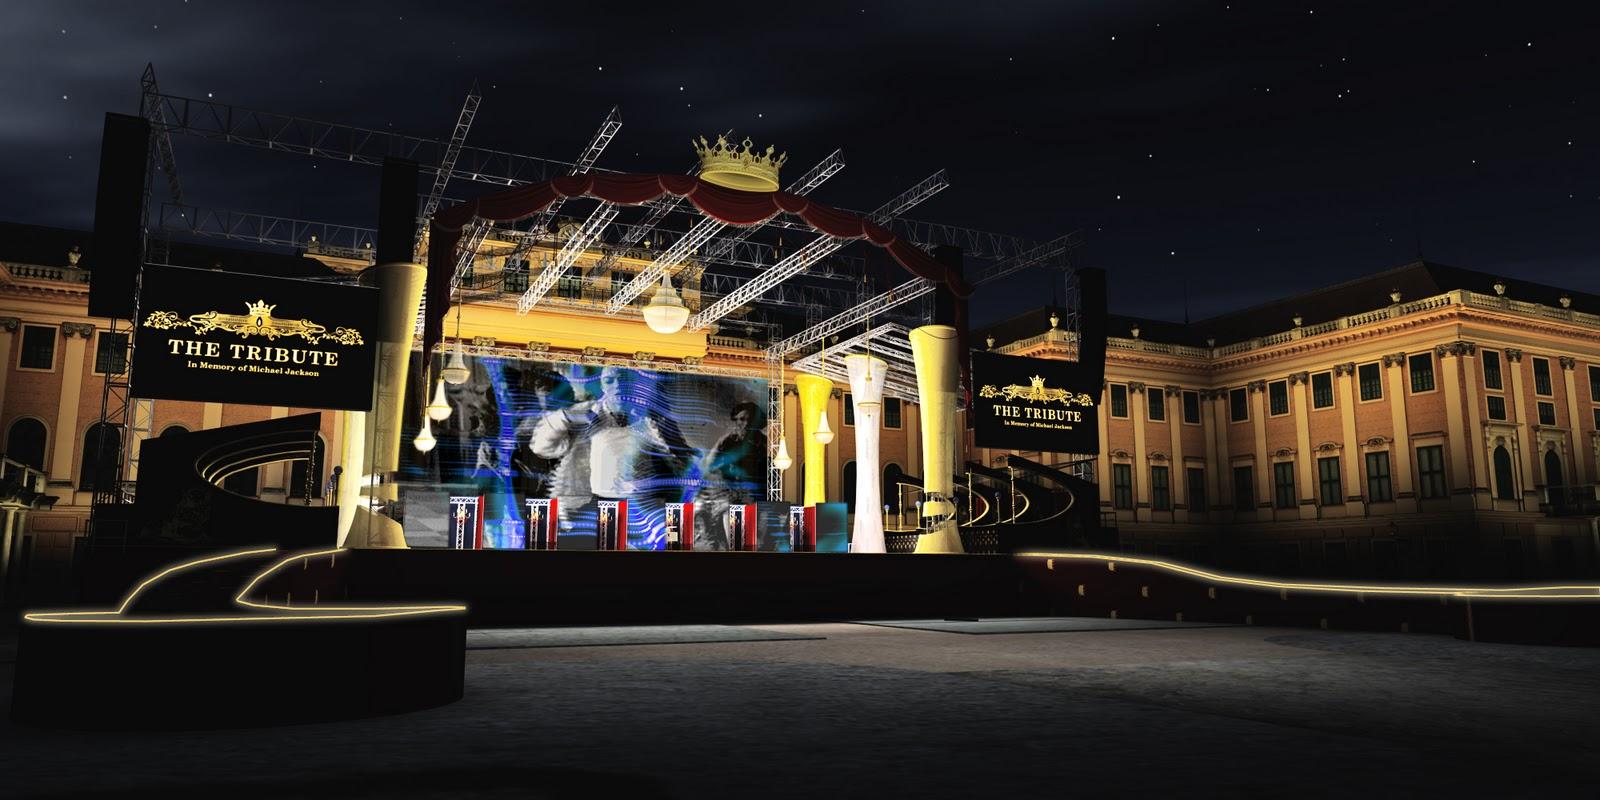 http://3.bp.blogspot.com/__iuYbs5zGVw/TRbFoggXnPI/AAAAAAAAAPM/xMHoRL0PrJA/s1600/Michael-Jackson-Tribute-Concert-1.jpg